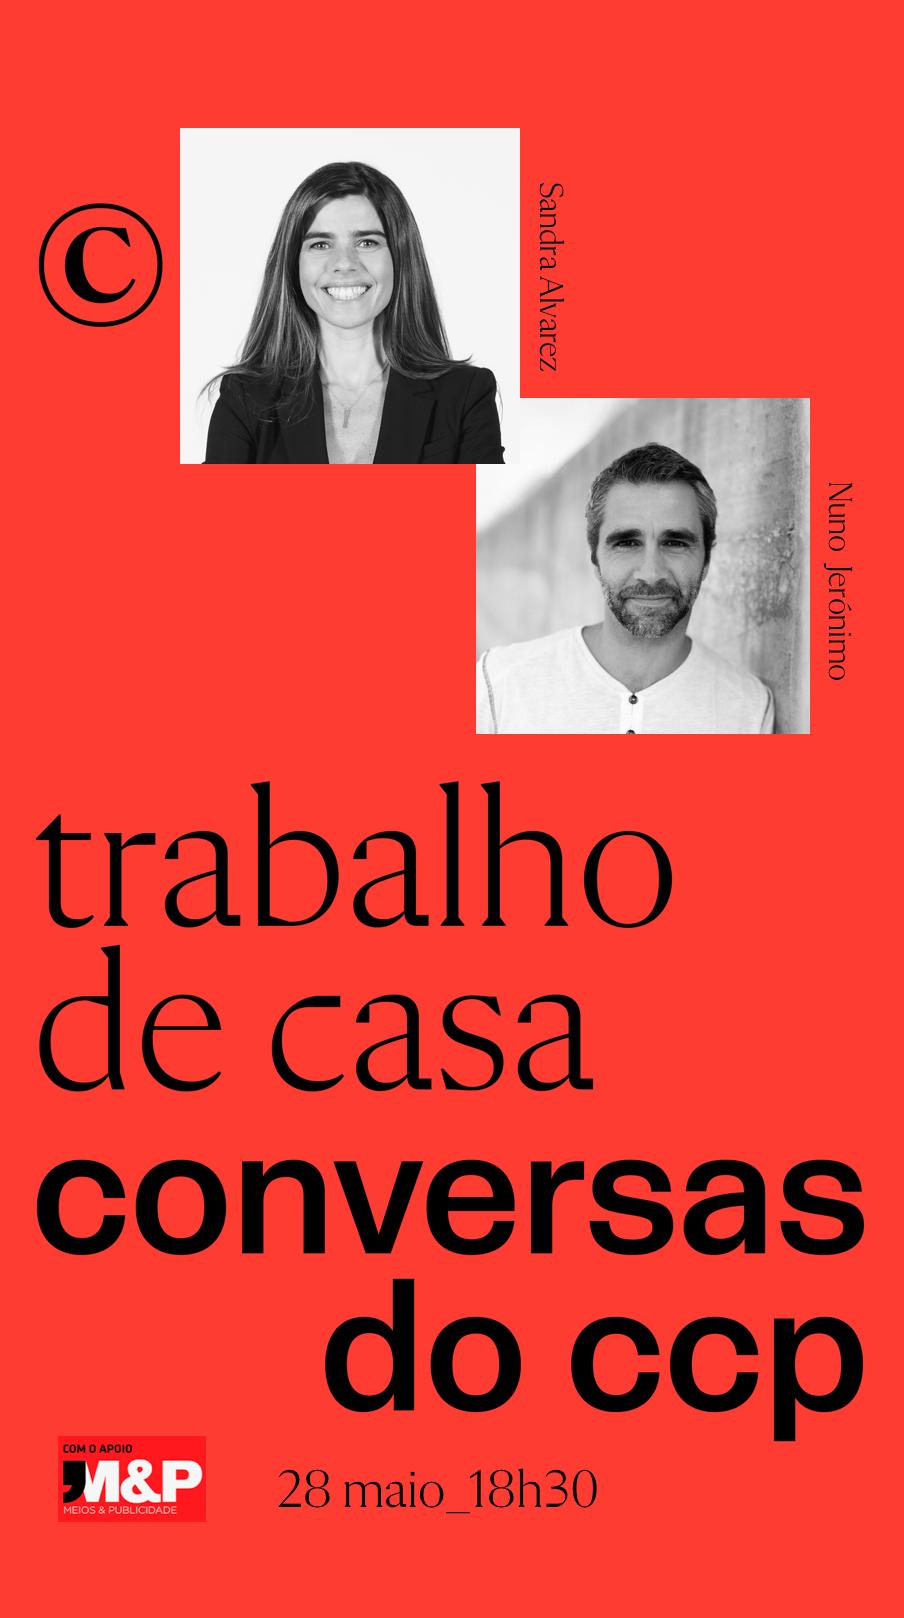 Sandra A e Nuno J Conversa CCP 28 maio